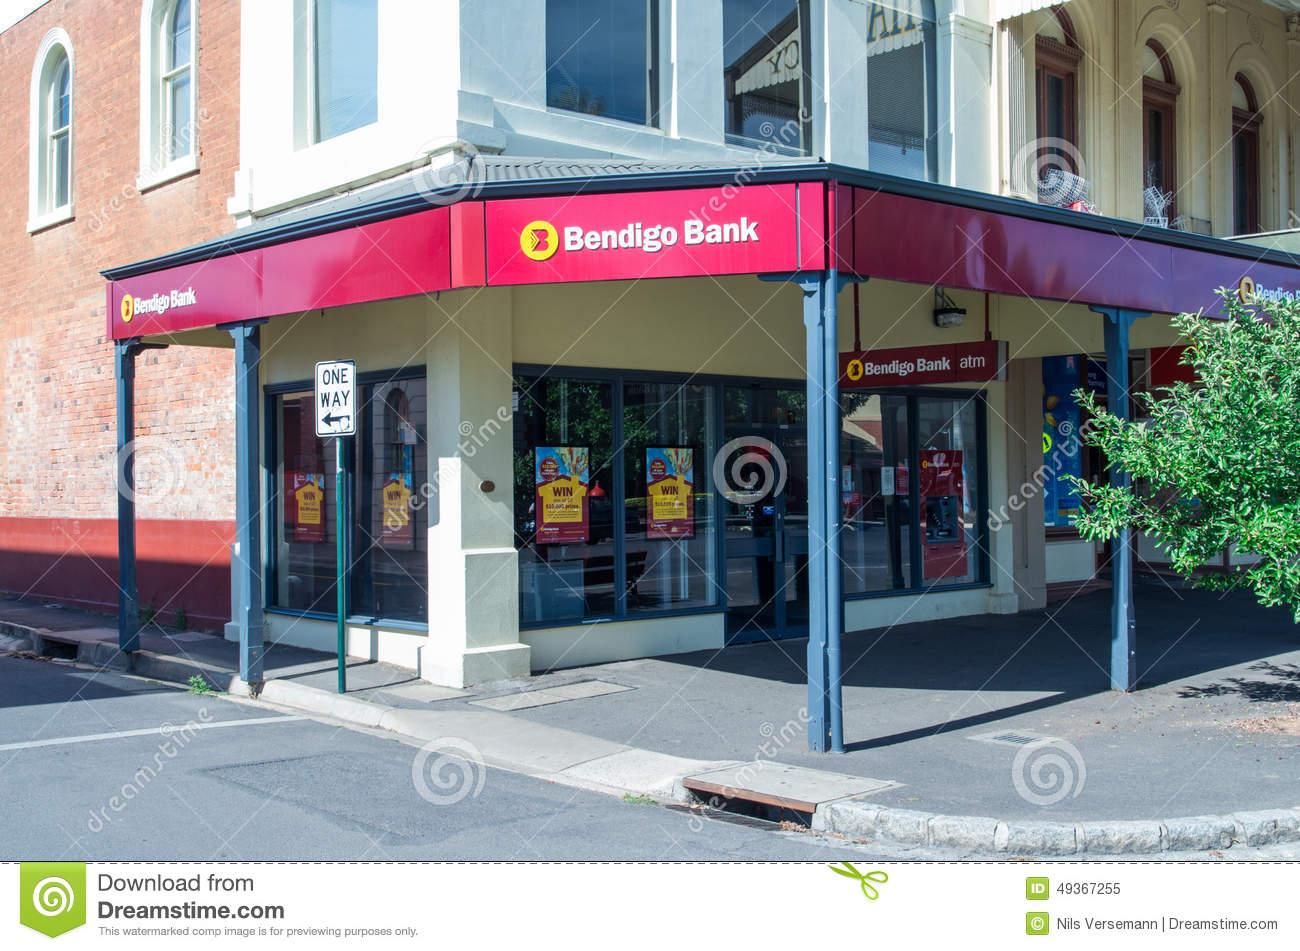 Bank branch clipart jpg black and white Bendigo Bank Branch Editorial Photo - Image: 42389566 jpg black and white